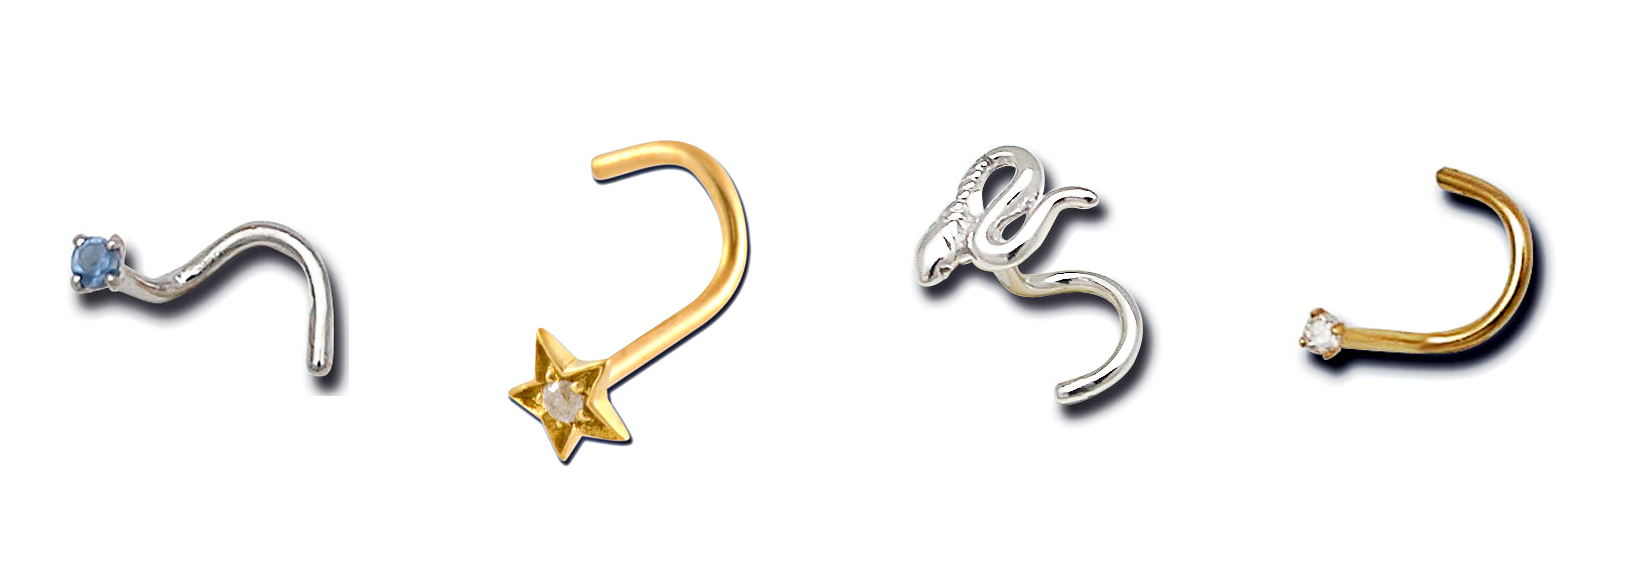 piercings-nez-or-18-carats